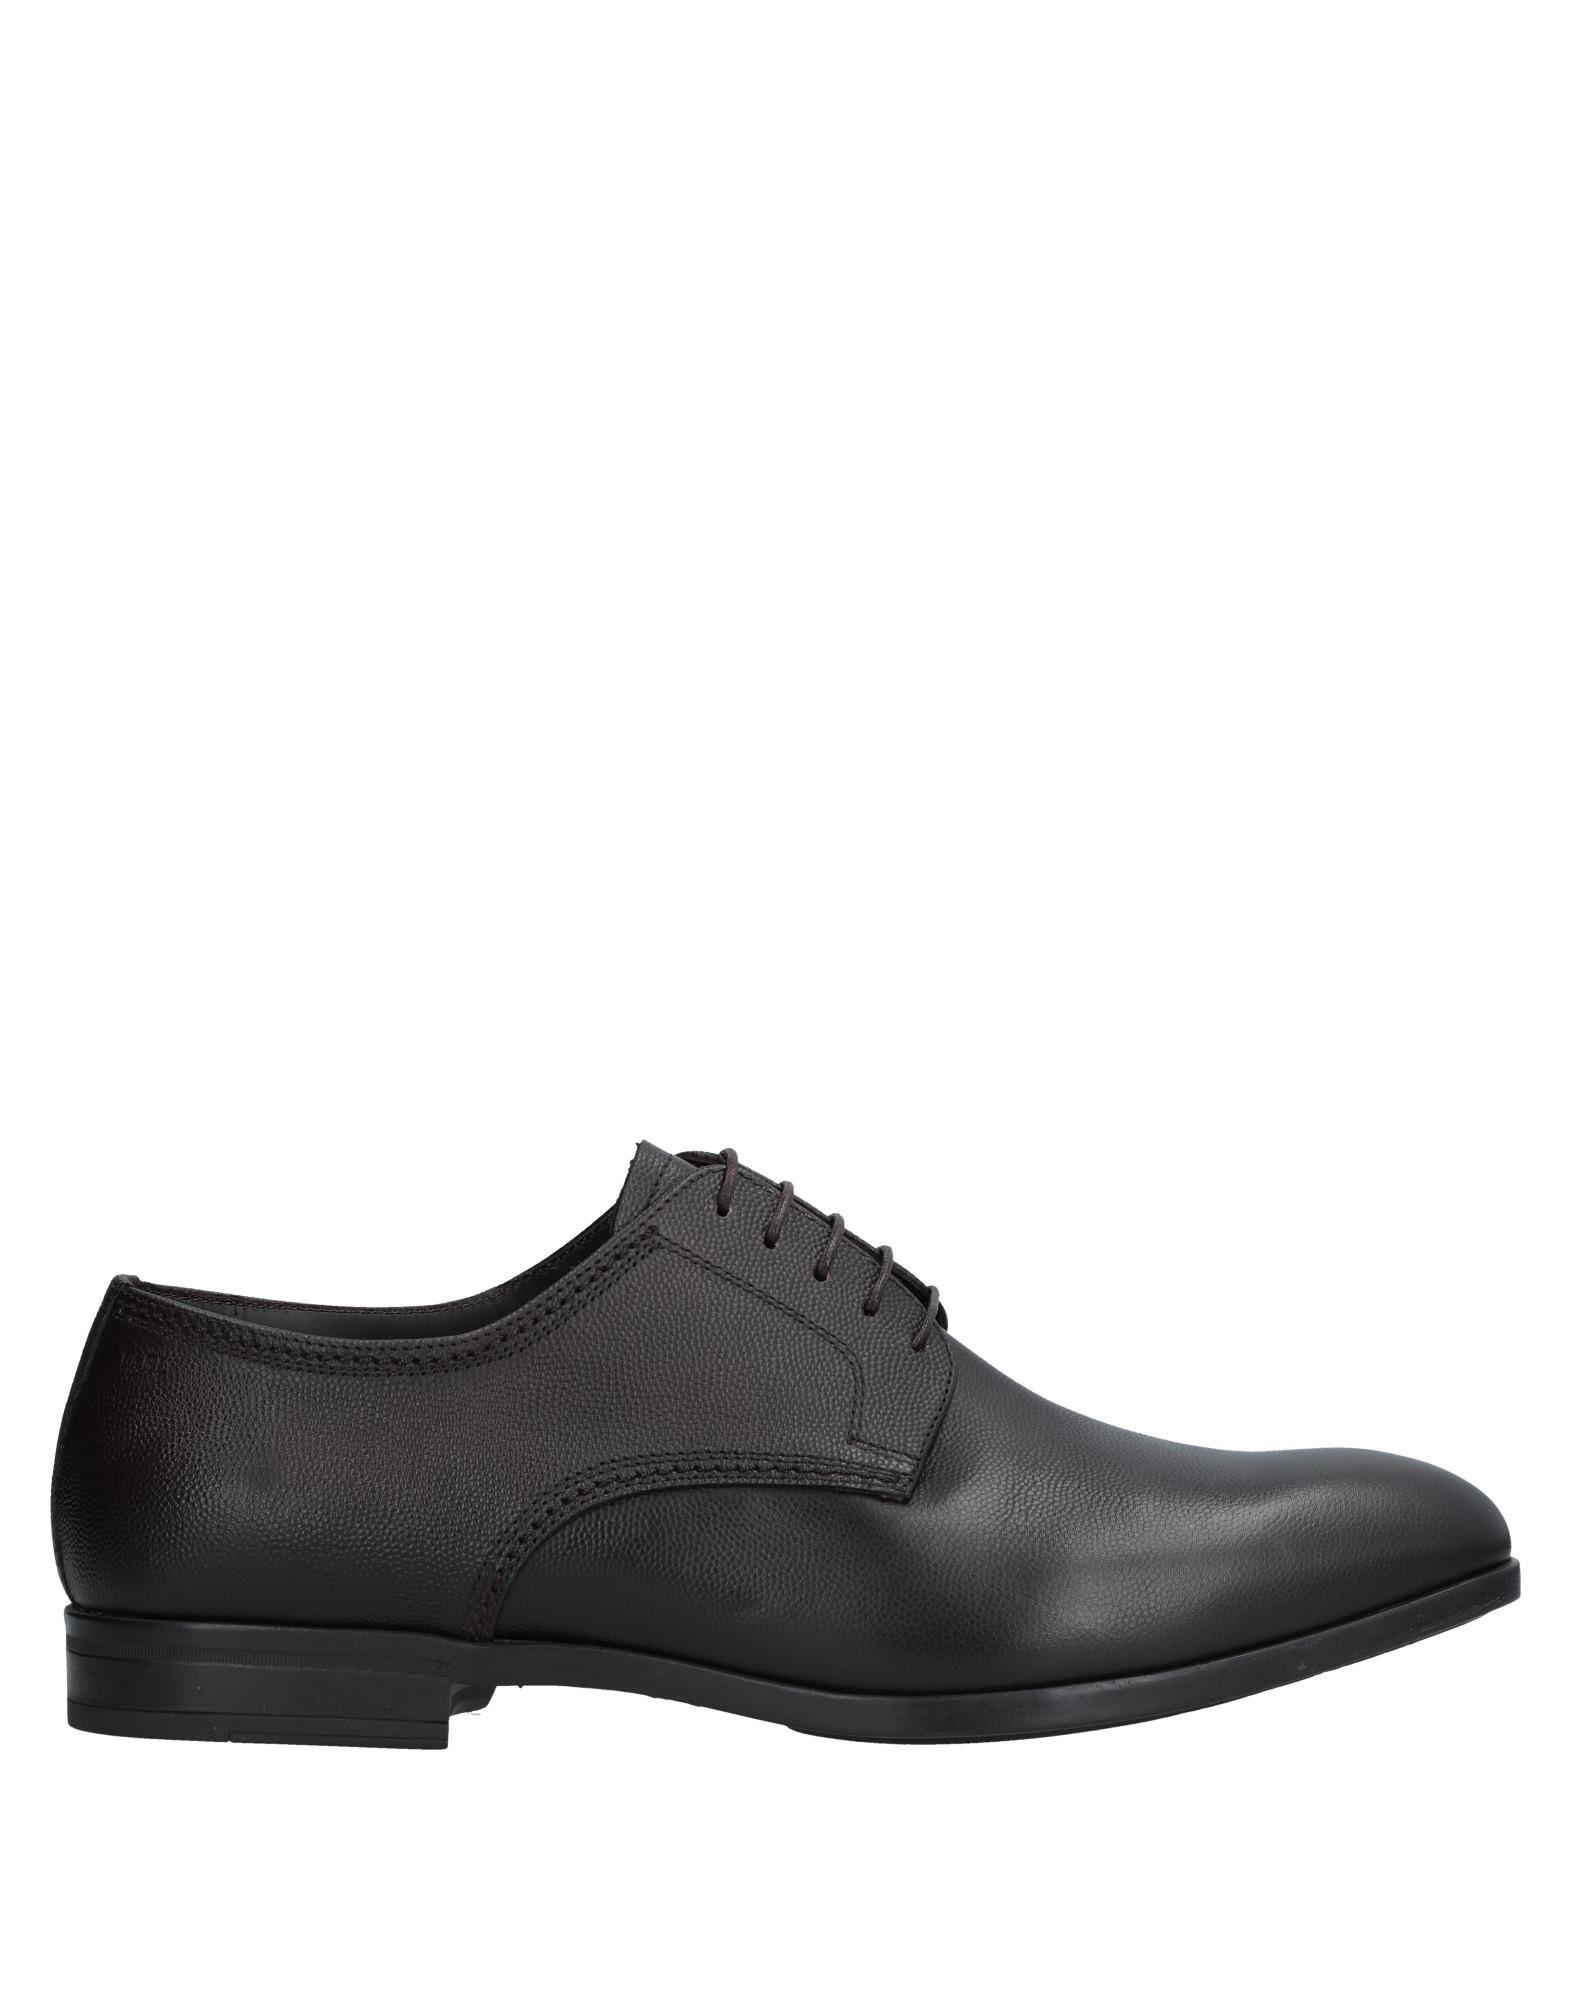 Fabi Heiße Schnürschuhe Damen  11537765GO Heiße Fabi Schuhe a6be73